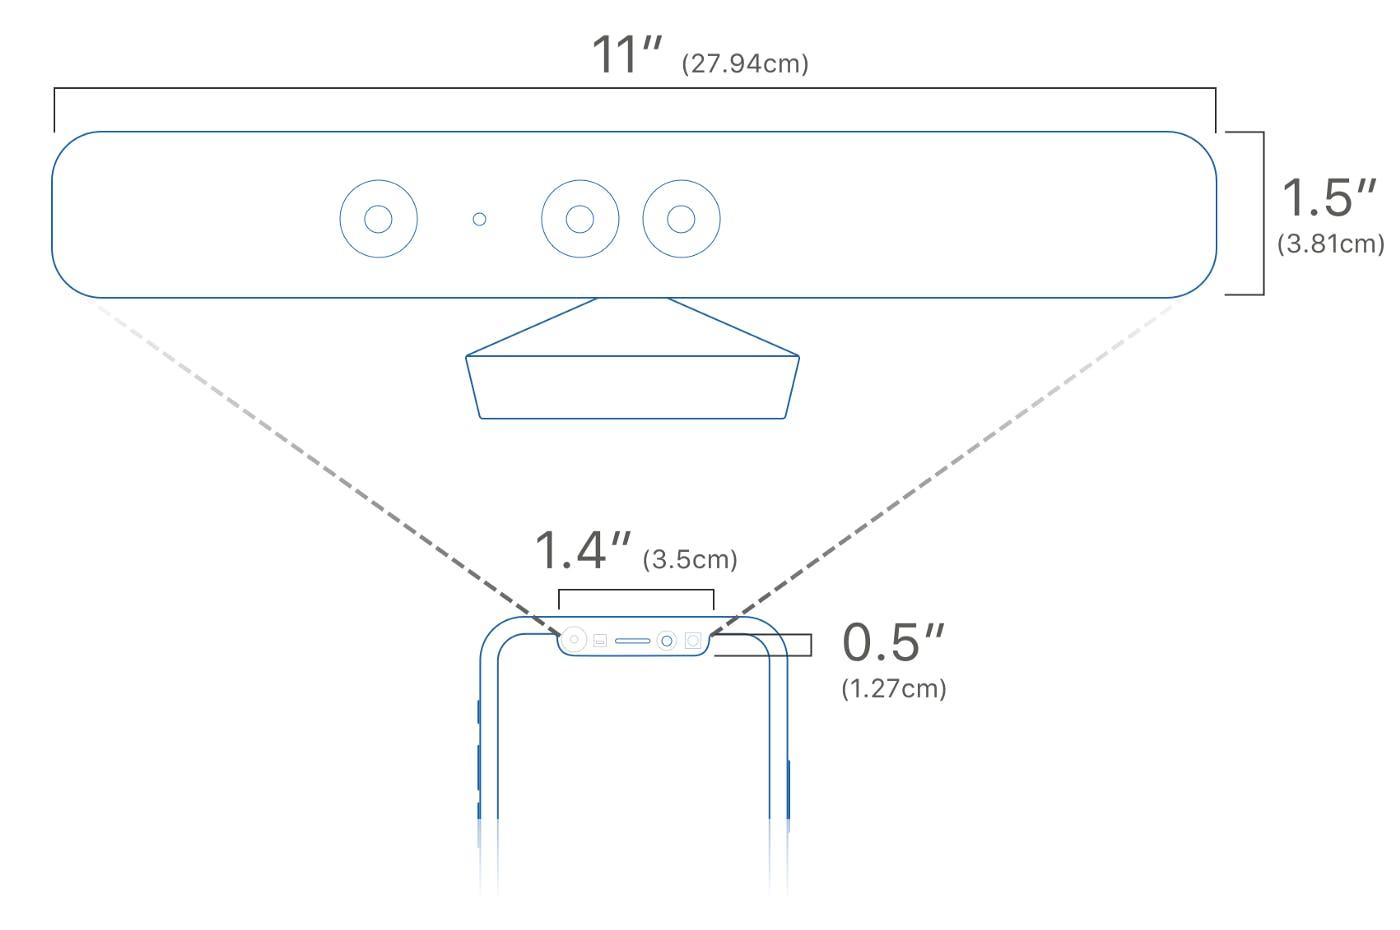 Kinkect vs. iPhone X's notch size comparison (source: uMake)